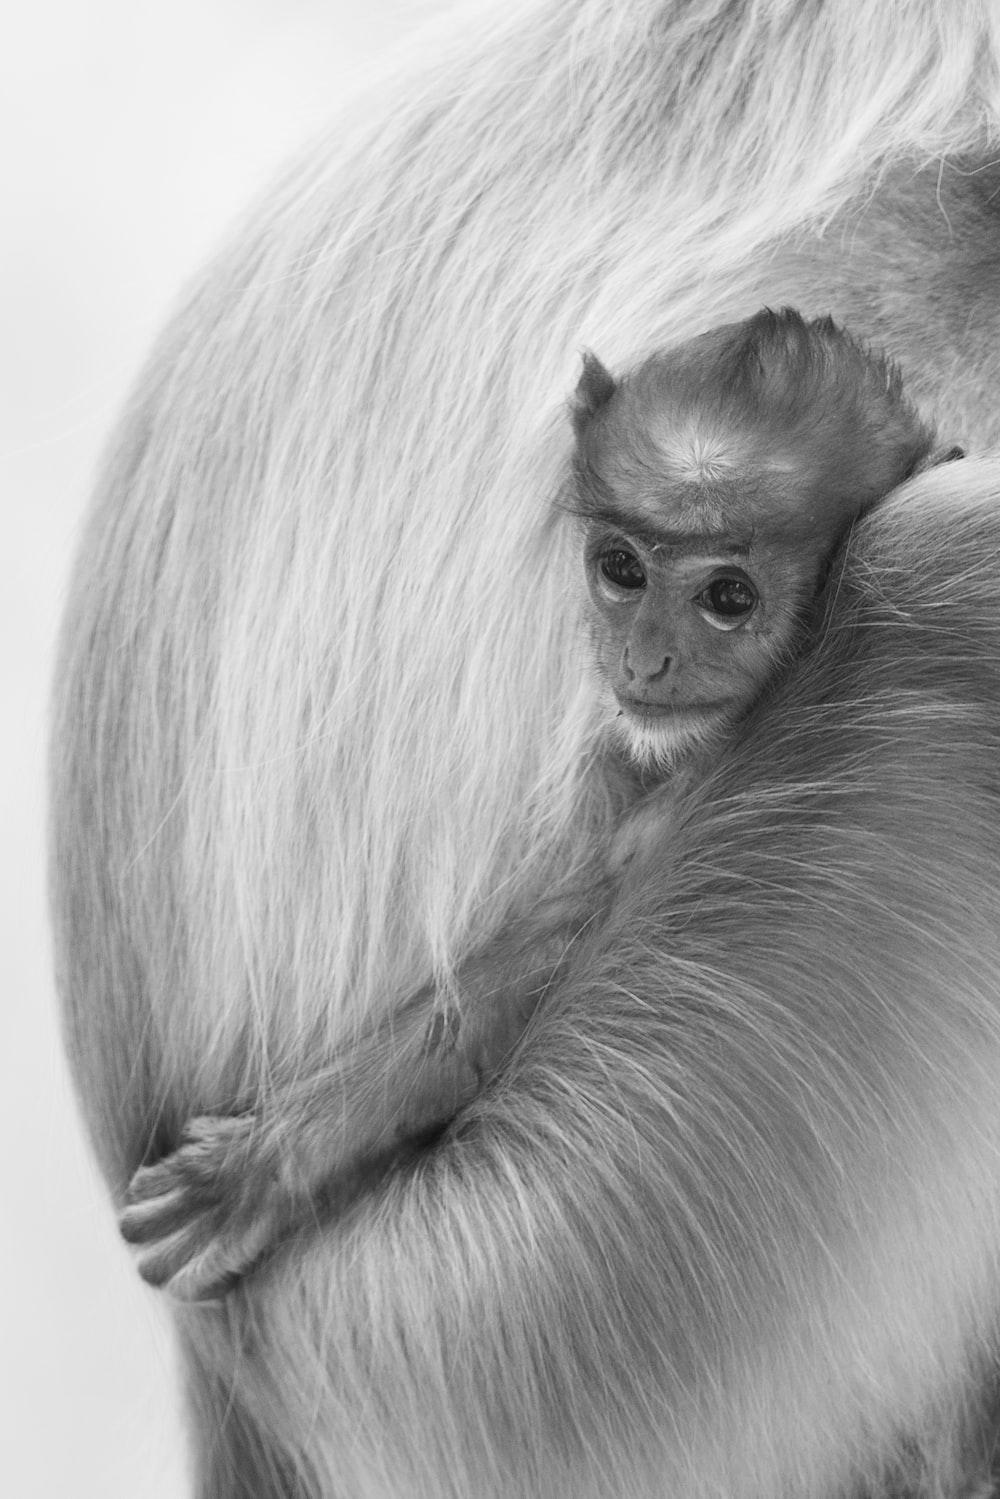 gray scale photo of monkey